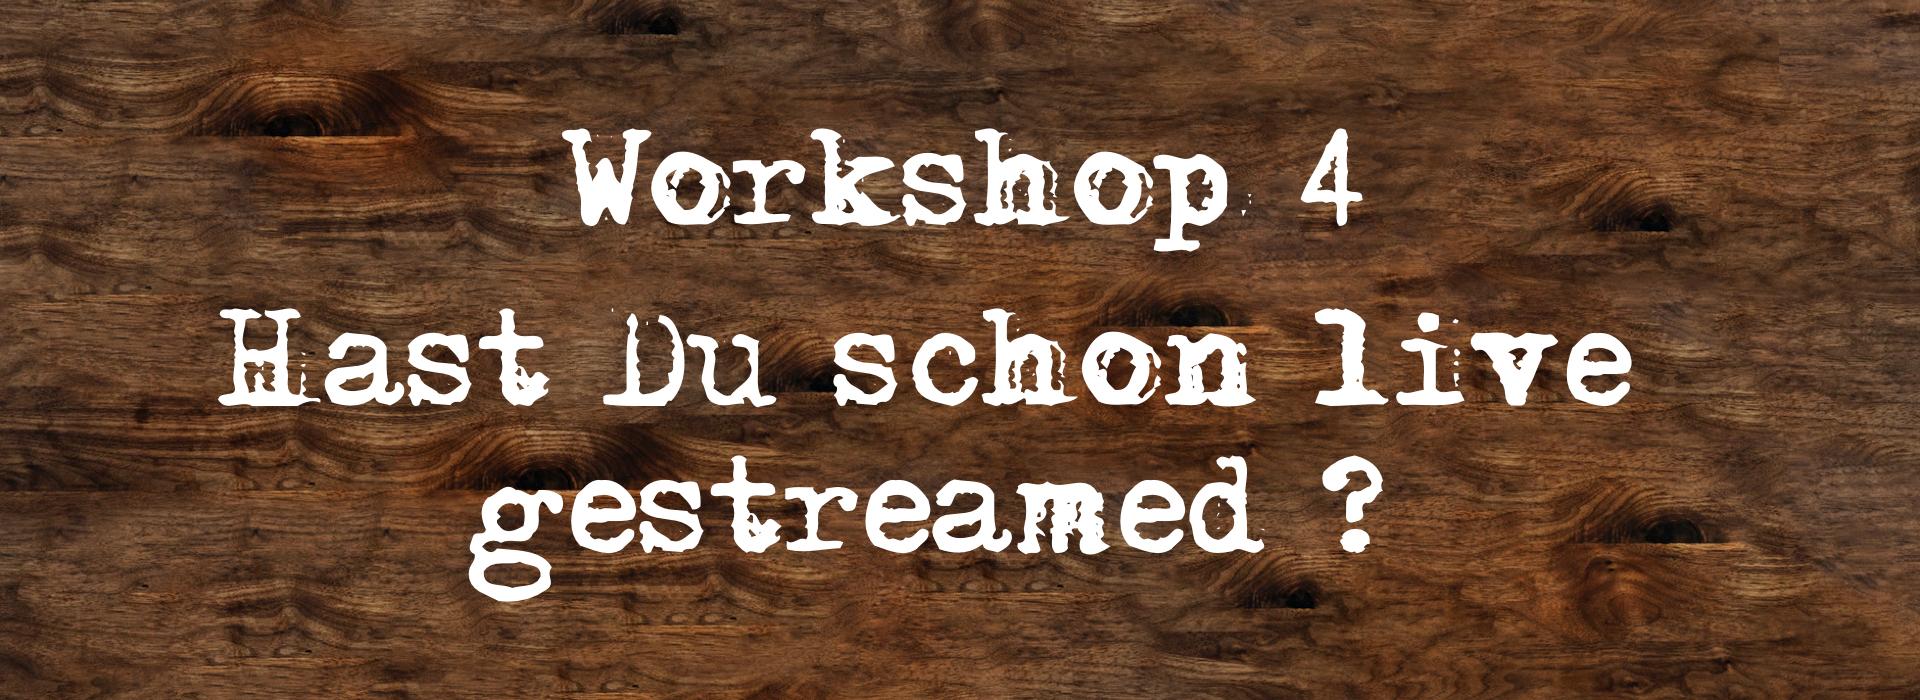 Social Media Workshop Grafik 1920 X 700.004.jpeg